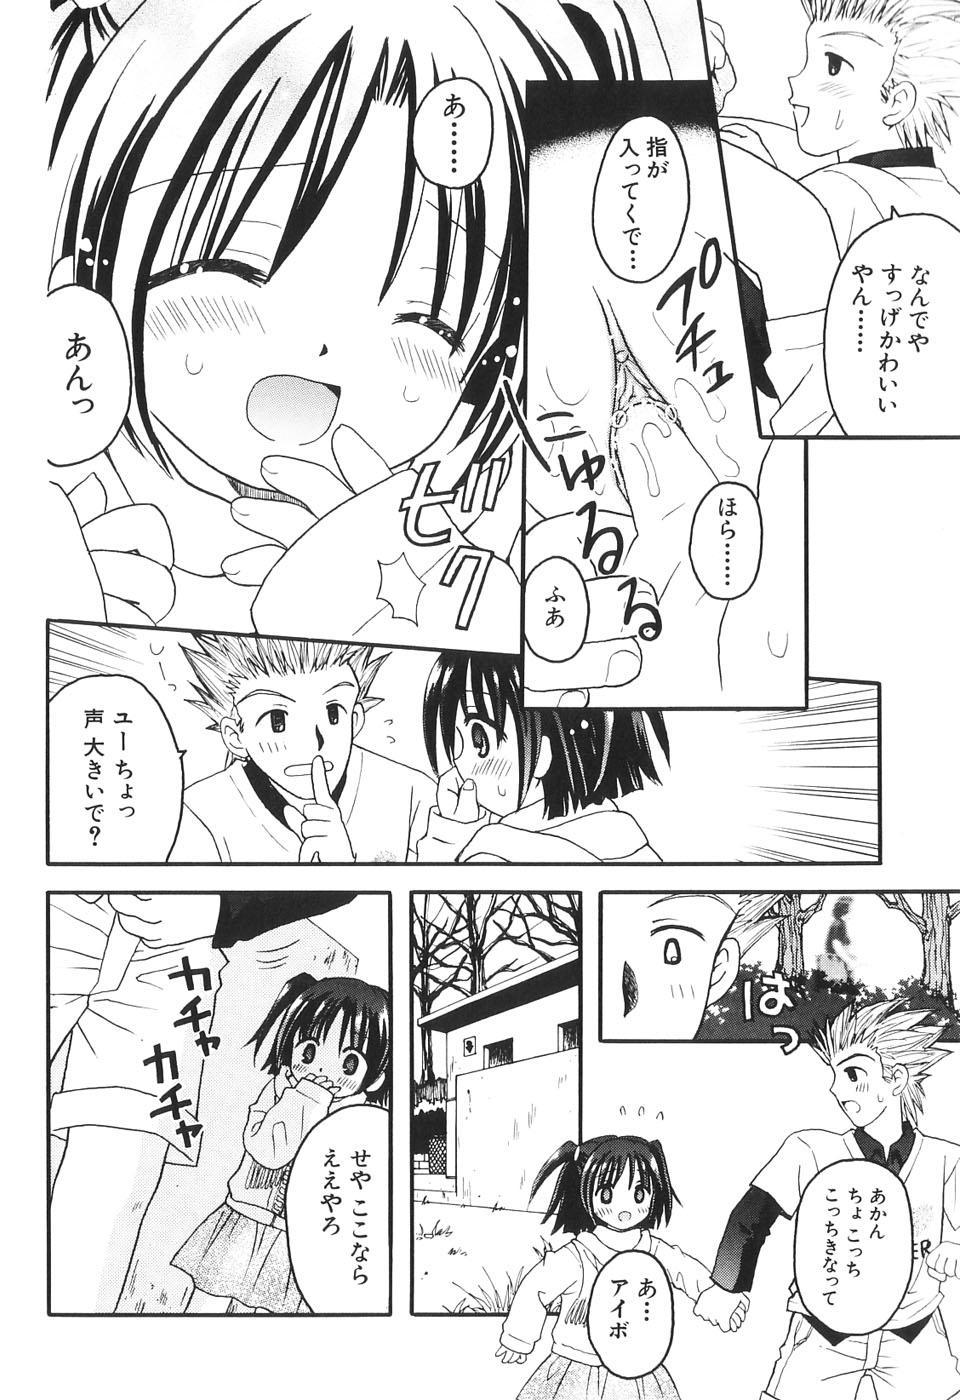 Musoubana 27